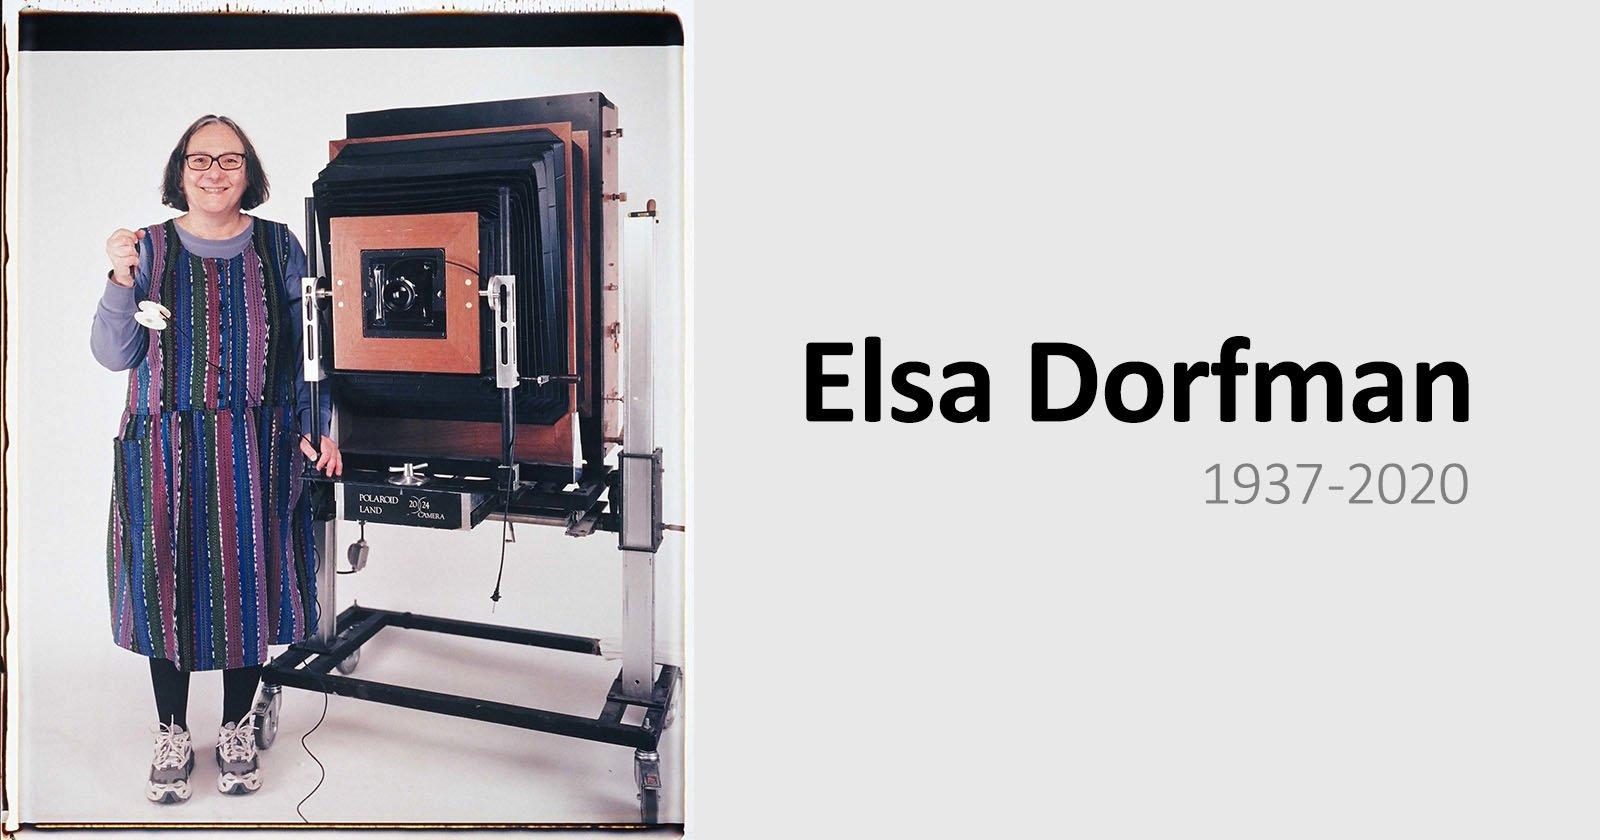 Elsa Dorfman, Giant Polaroid Camera Photographer, Dies at 83